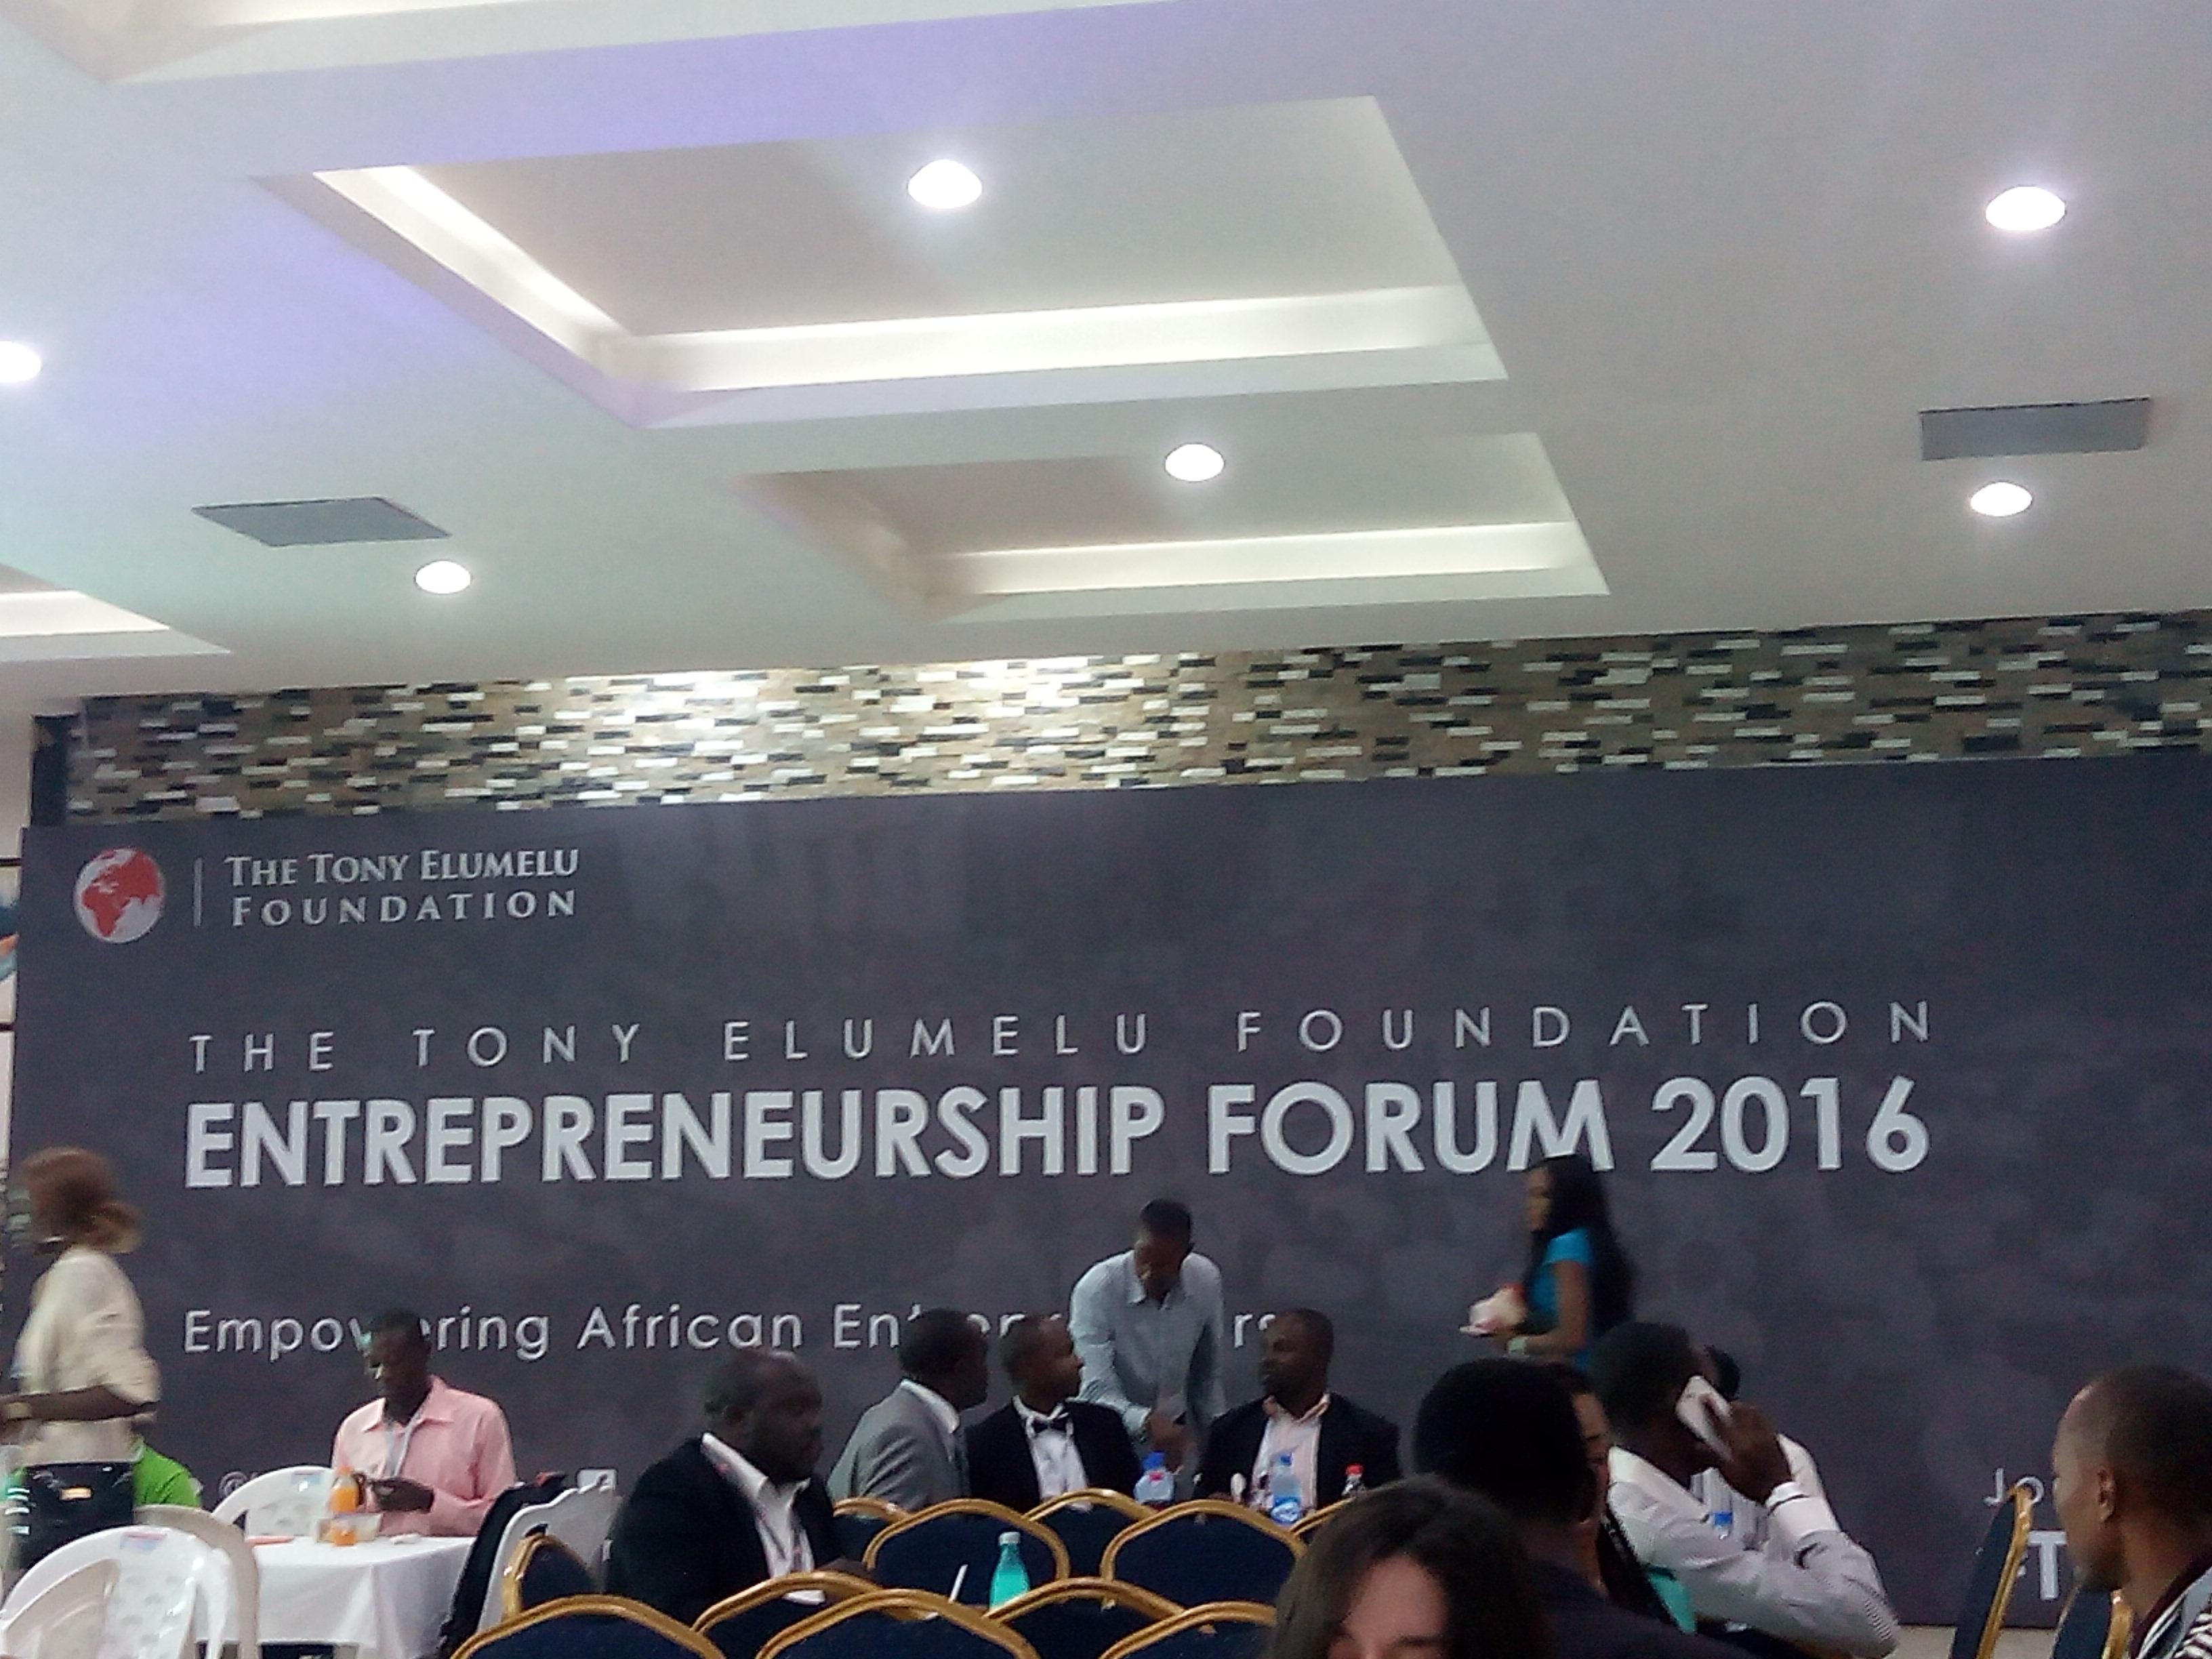 10tony-elumelu-entrepreneurship-forum-2016